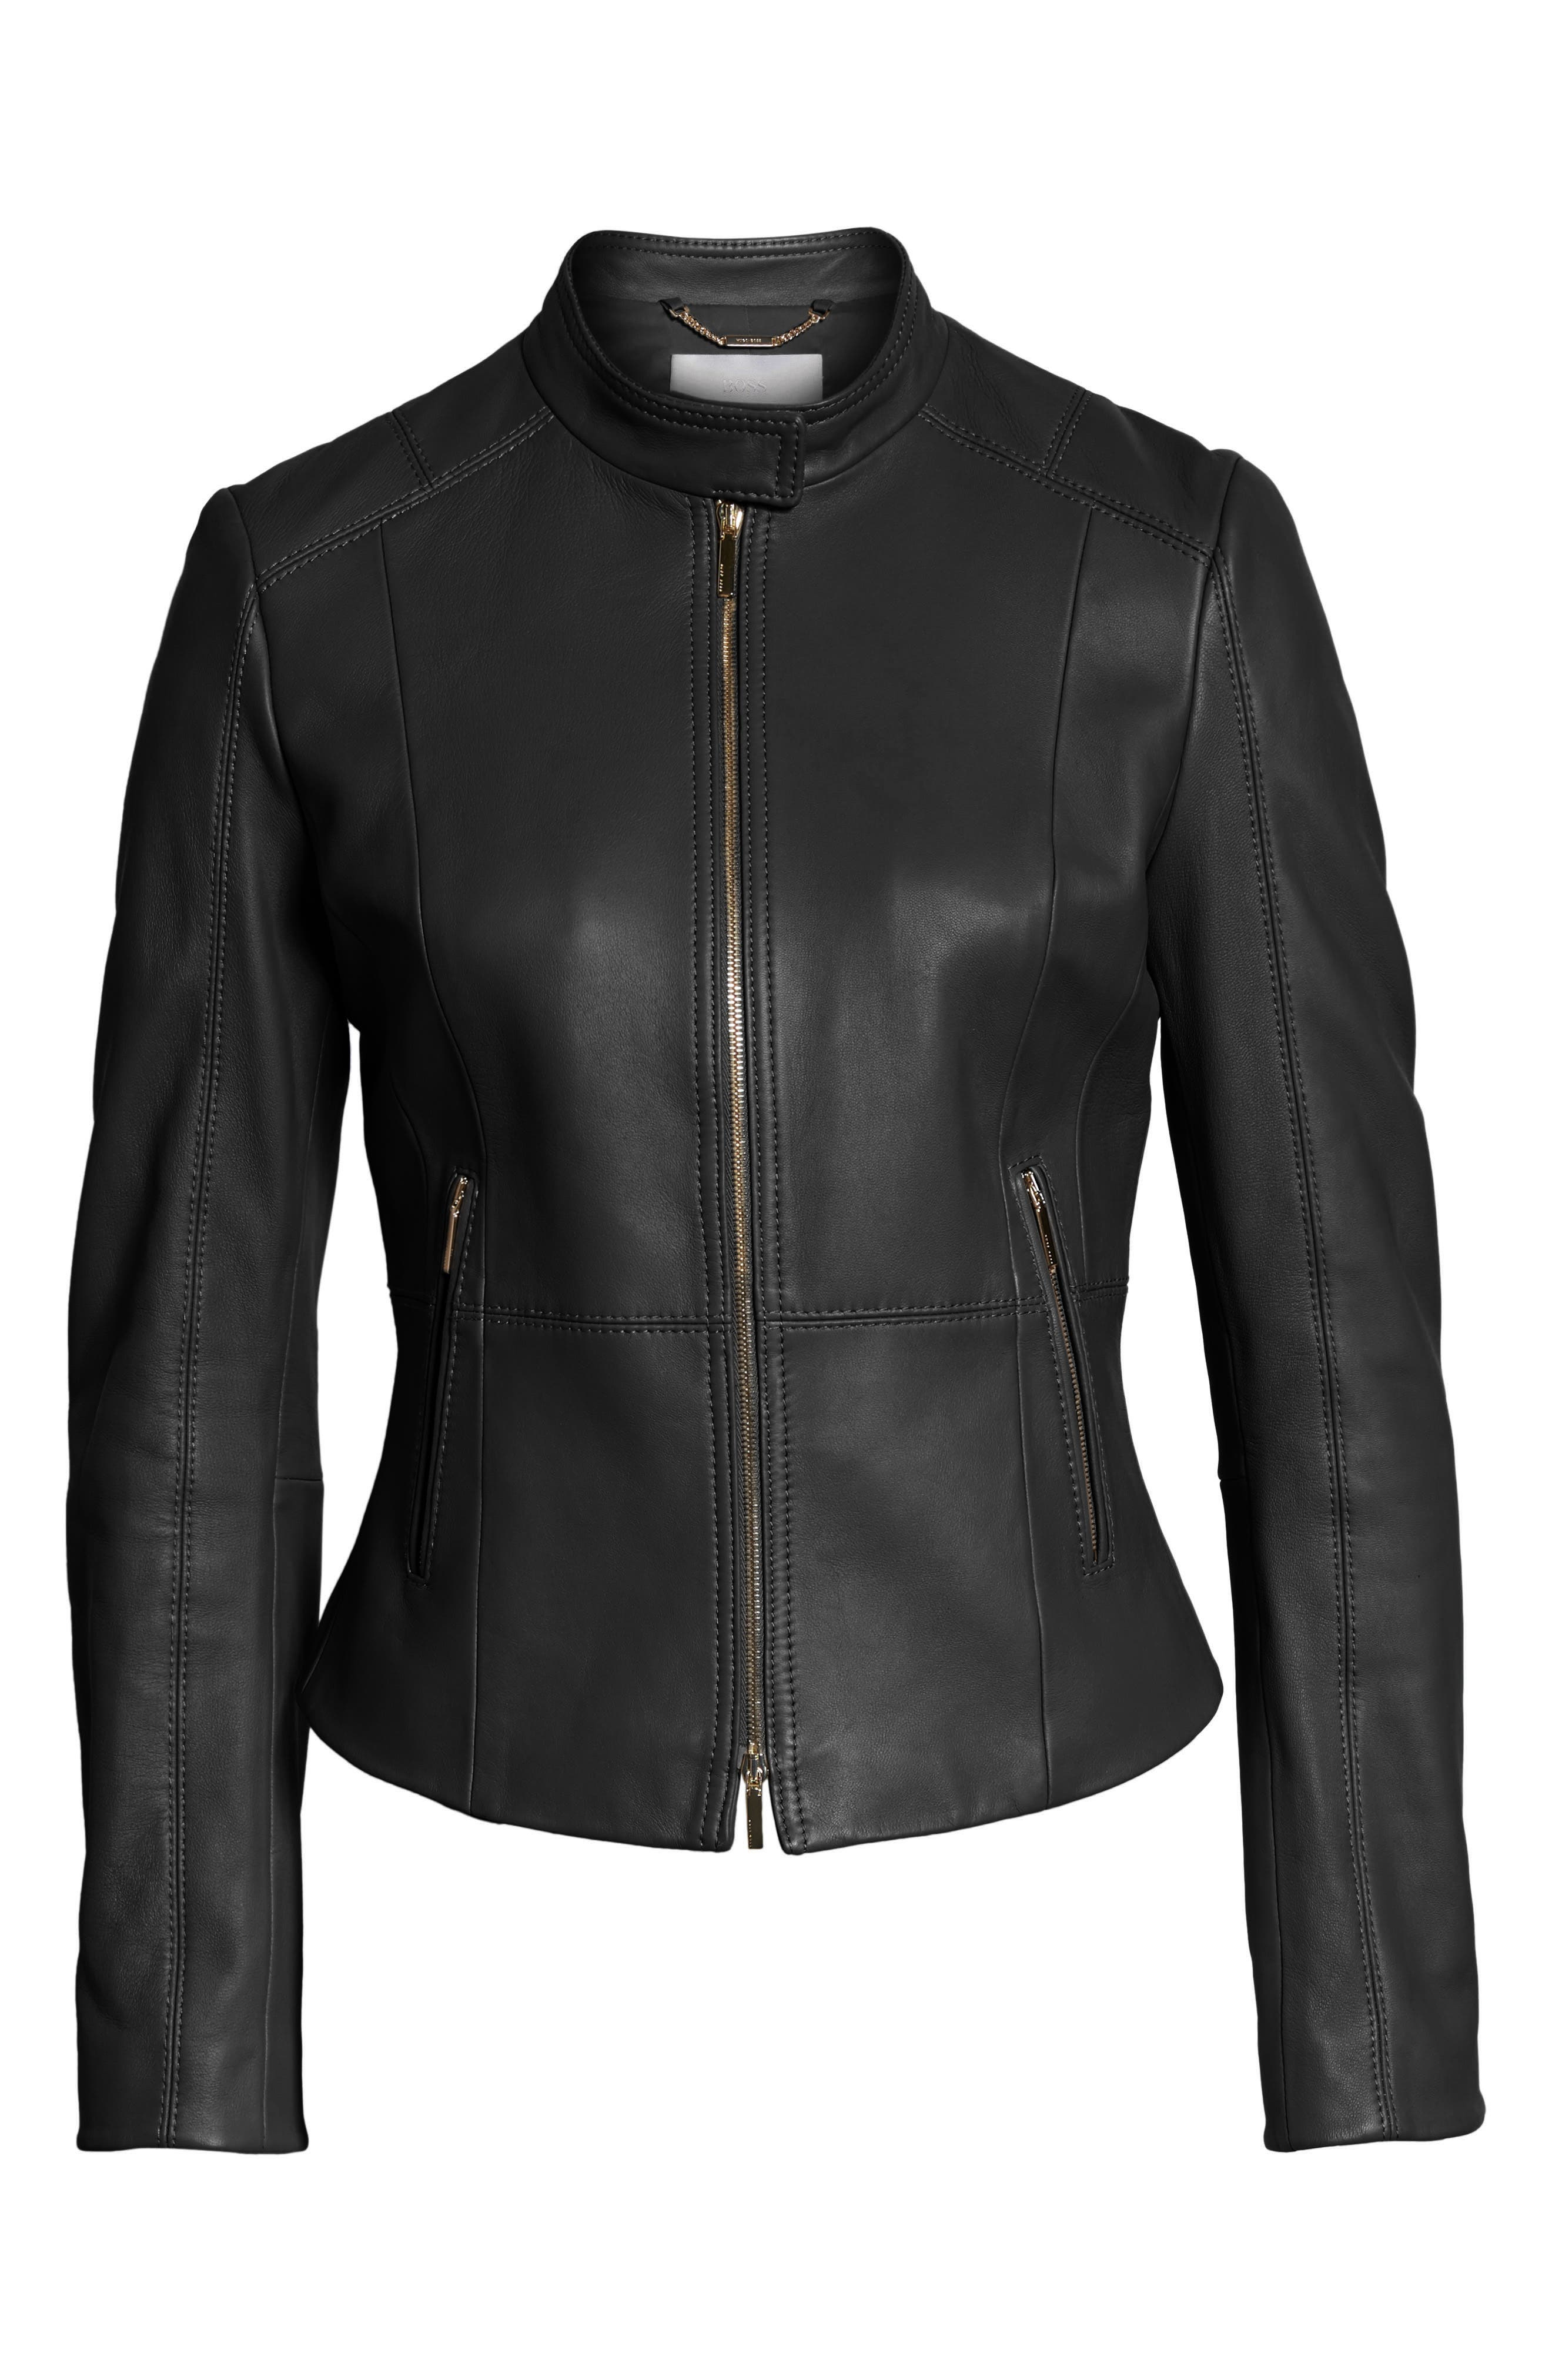 Sammonaie Leather Jacket,                             Alternate thumbnail 2, color,                             001